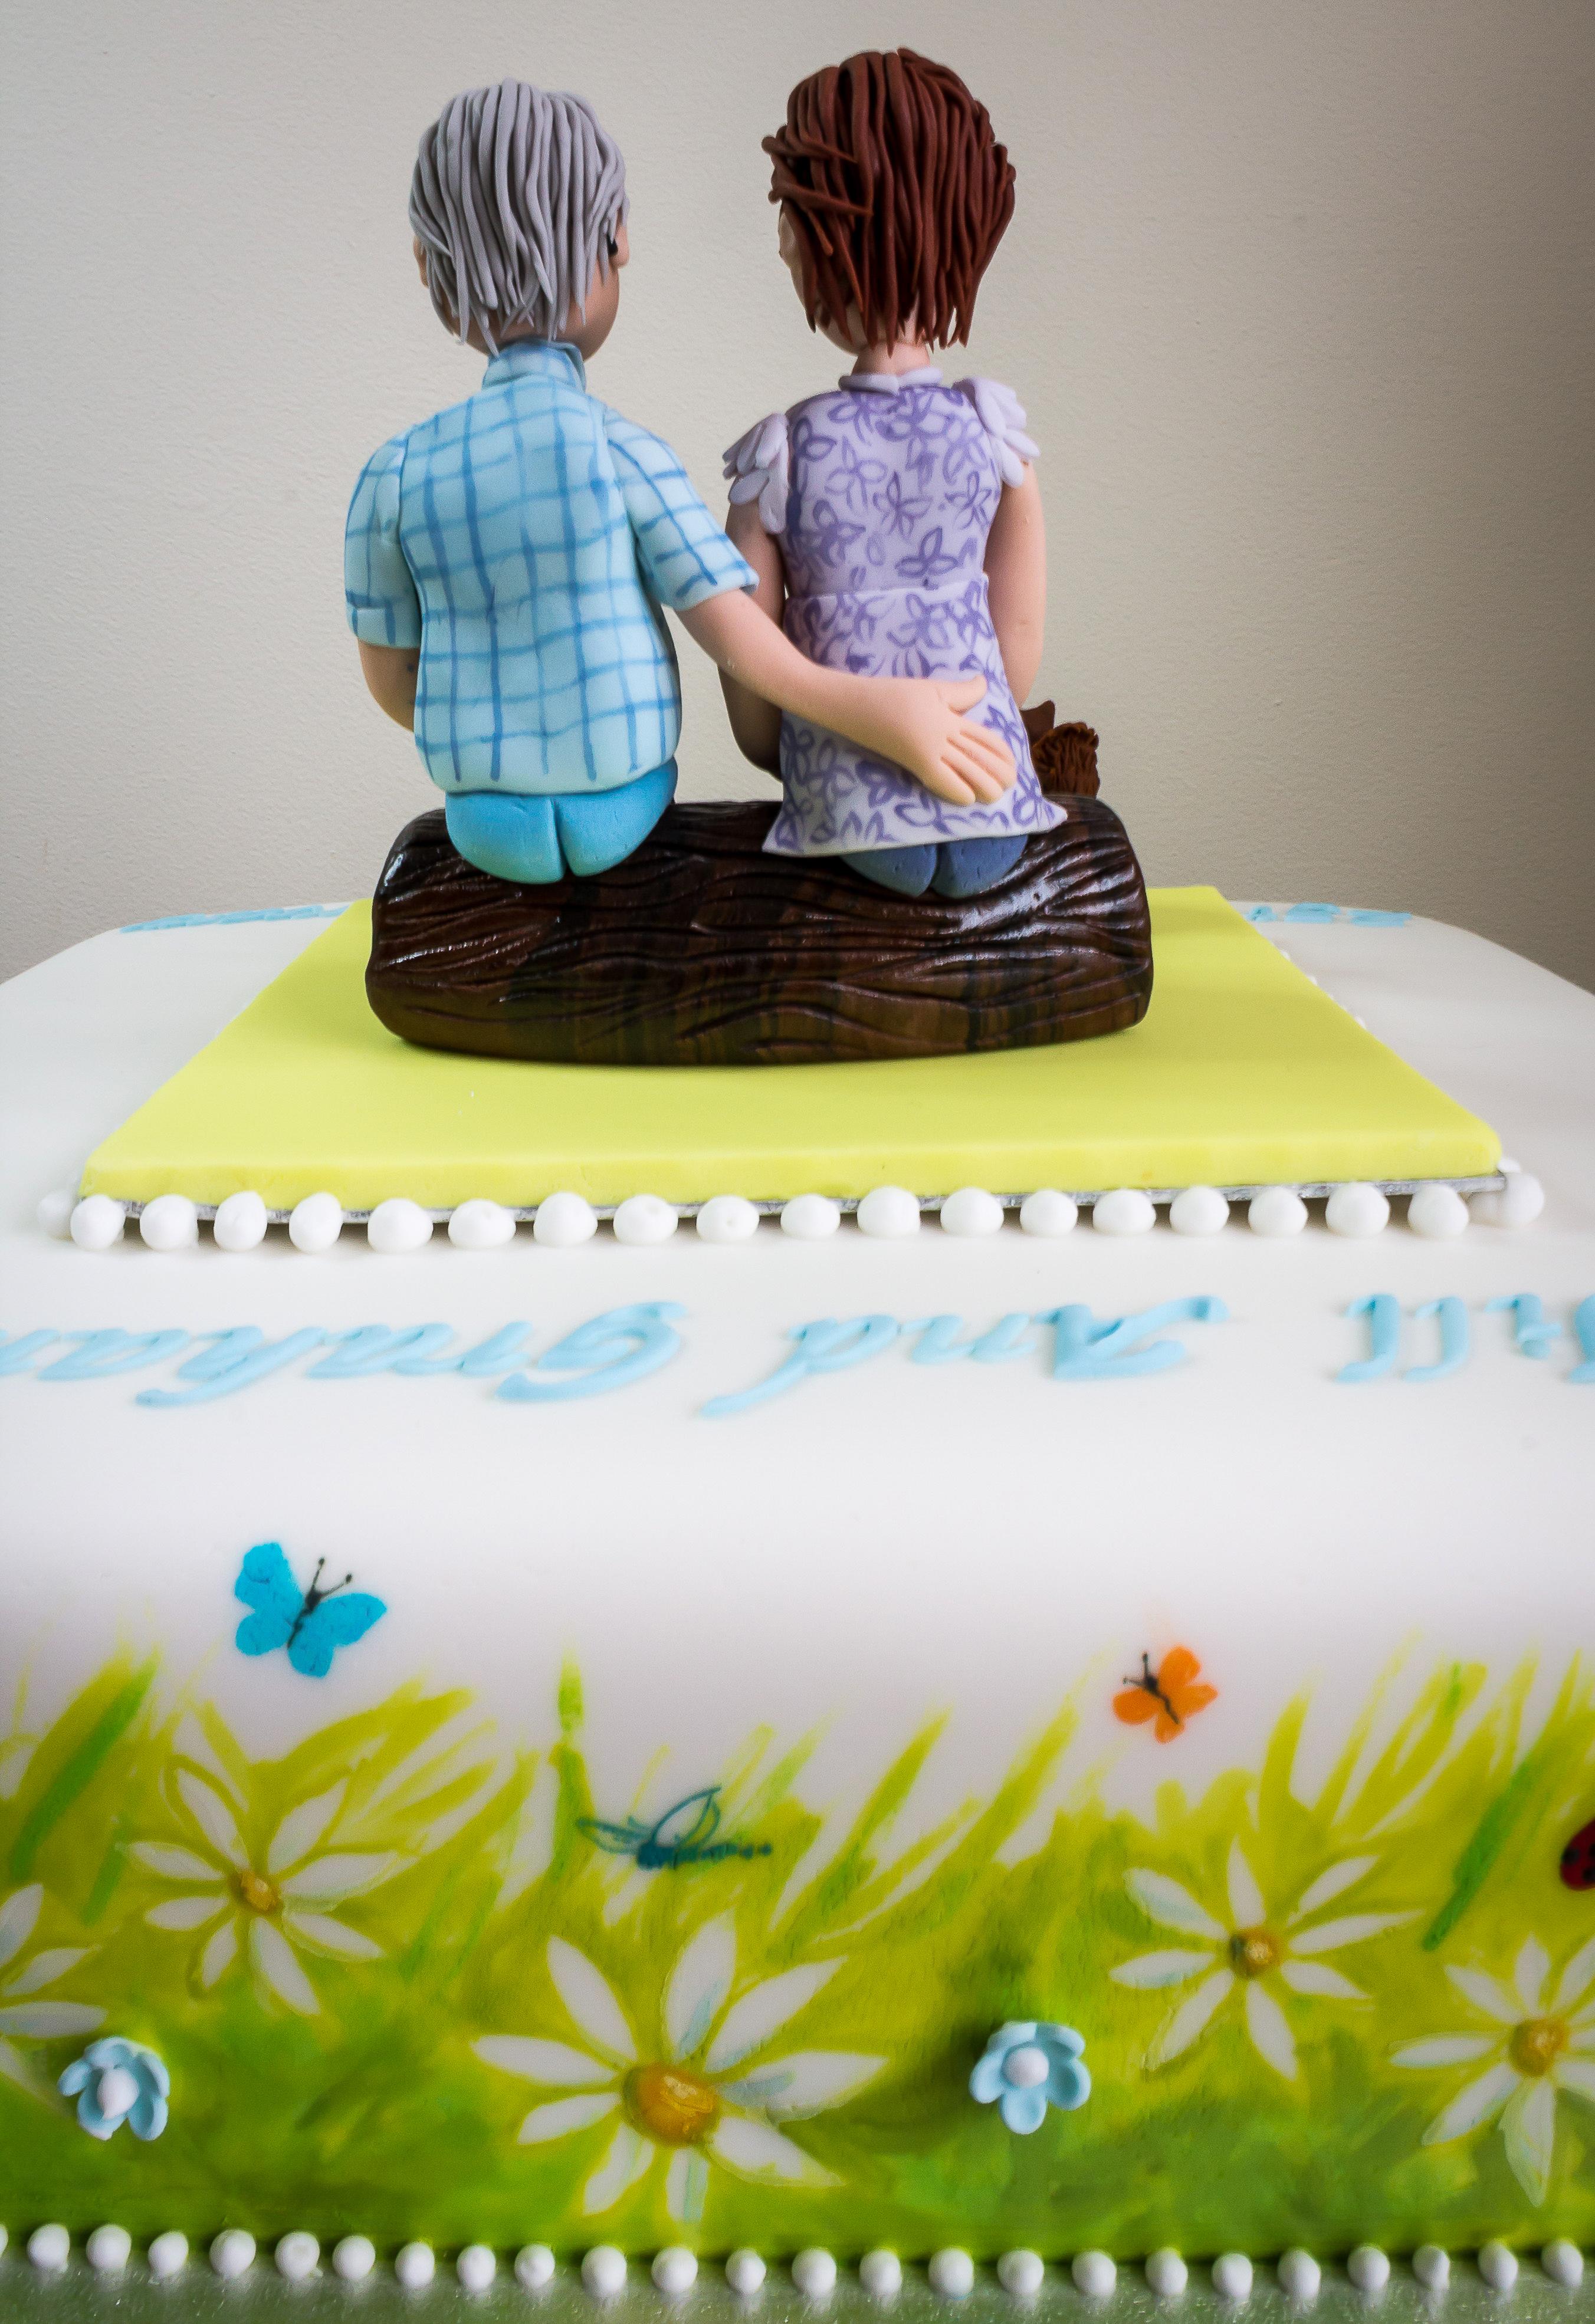 Hand Painted Ramblers 25th Wedding Anniversary Celebration